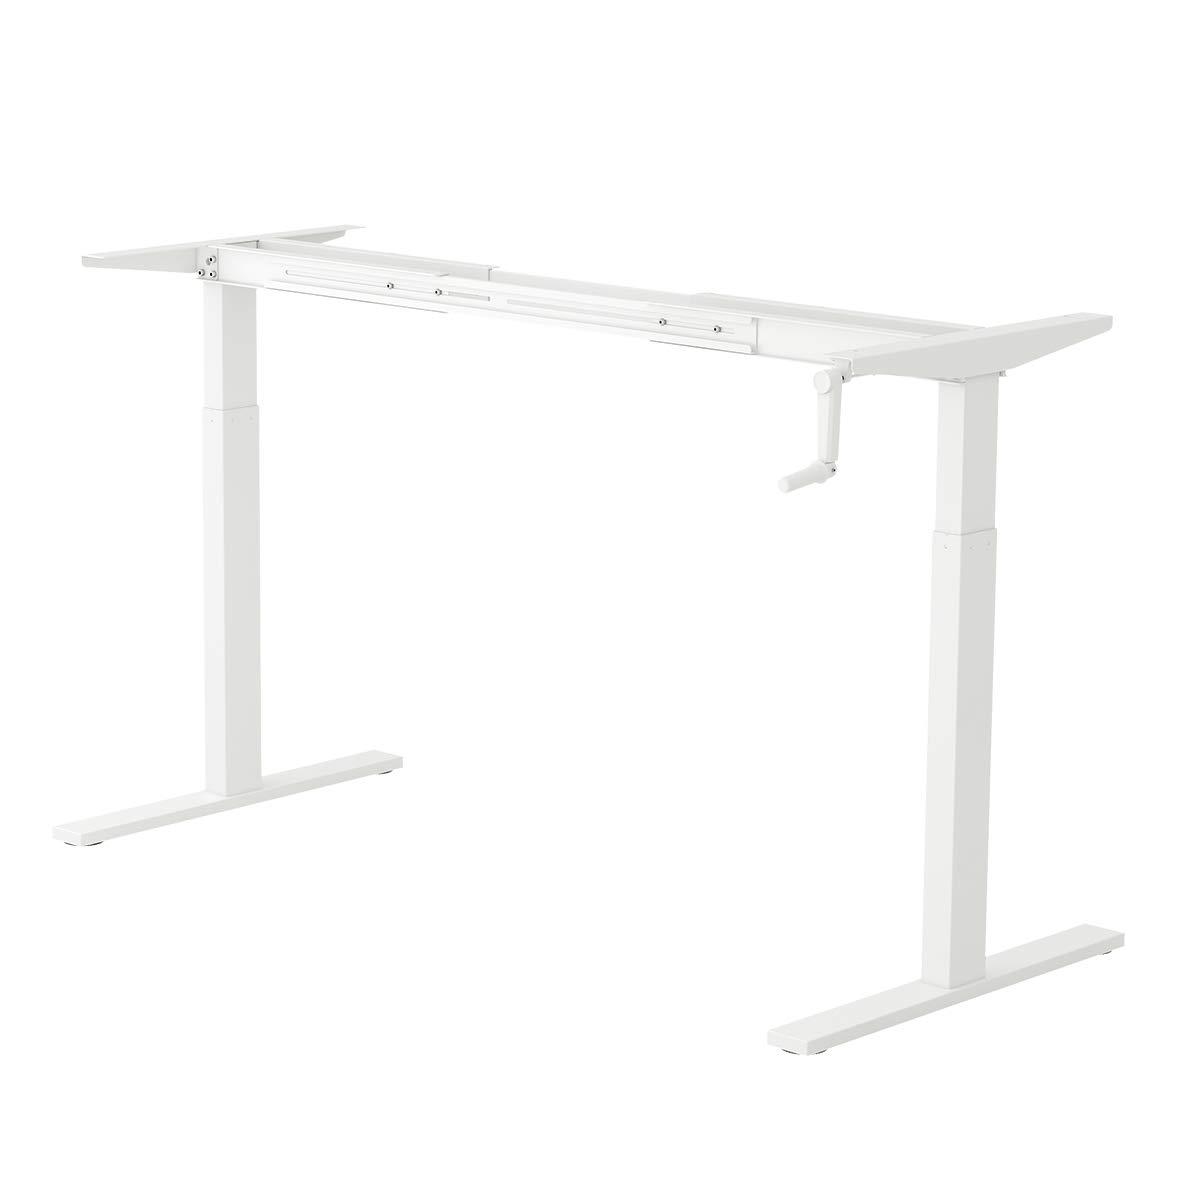 DEVAISE Height Adjustable Standing Desk Frame with Crank Handle